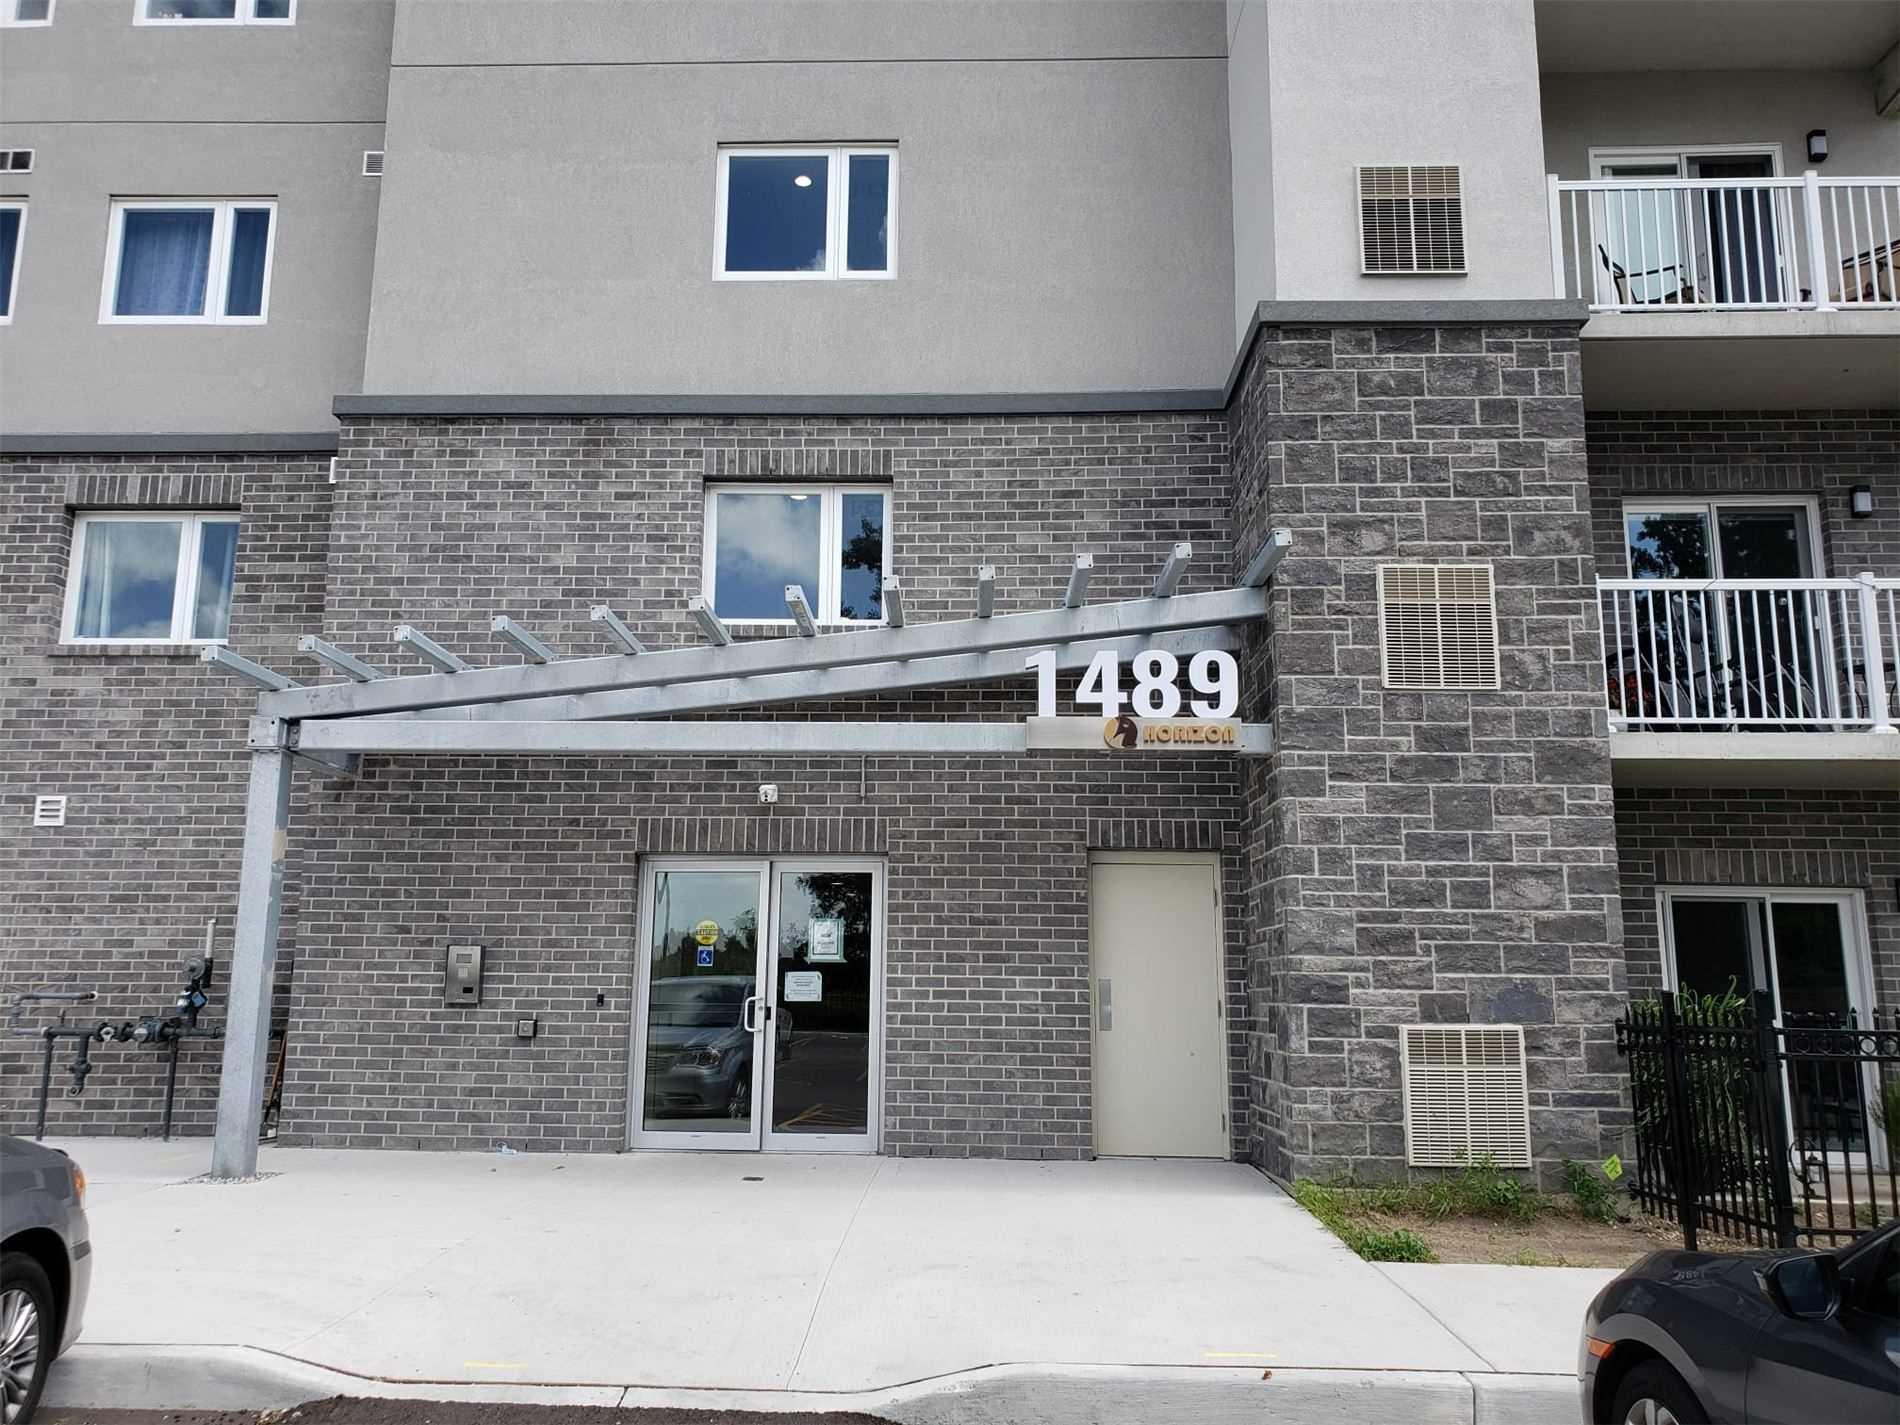 1489 Banwell Rd, Windsor, Ontario N8P0G4, 1 Bedroom Bedrooms, ,2 BathroomsBathrooms,Condo Apt,For Sale,Banwell,X5354506